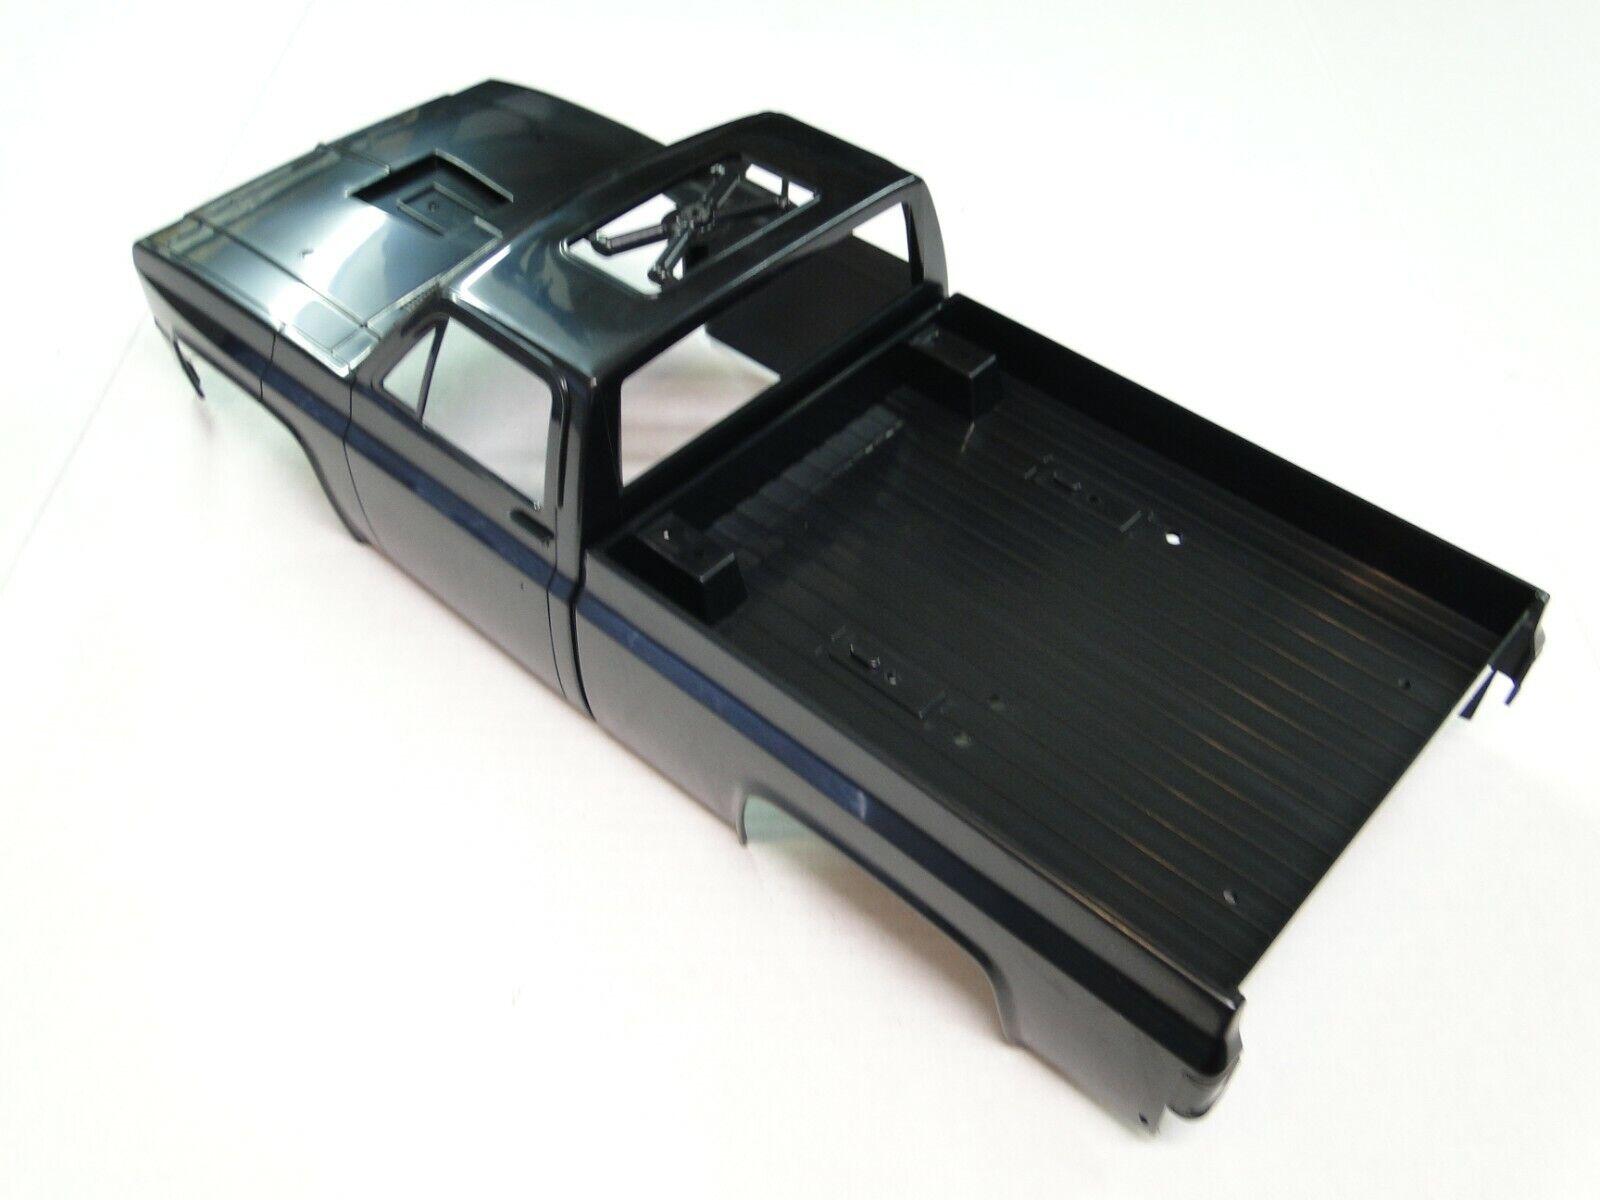 PWR-011 Powershift RC Technologies Tamiya Clod Buster Headlight Kit